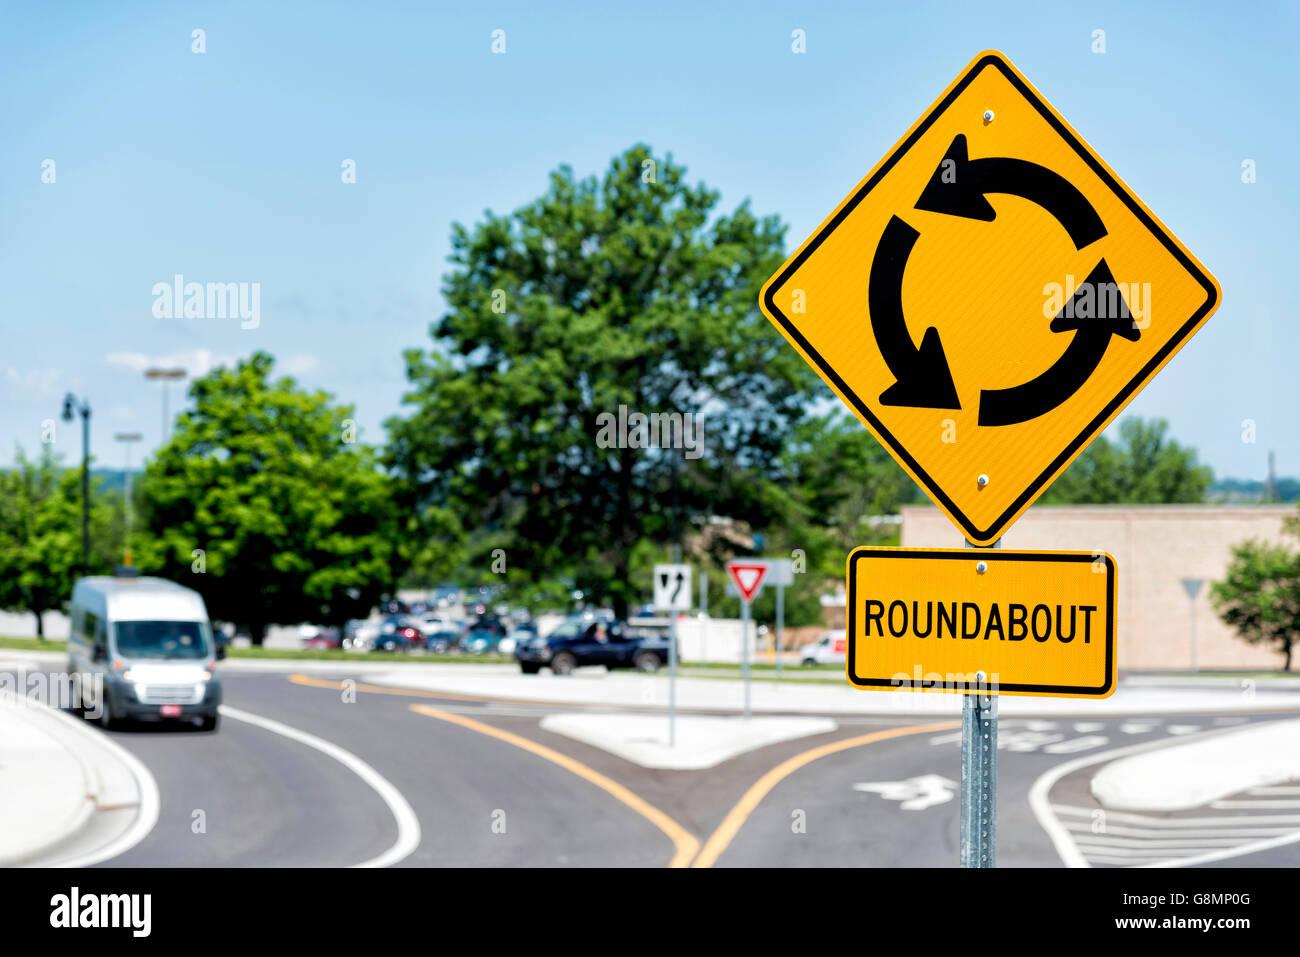 Roundabout sign  showing roundabout intersection. Horizontal shot. - Stock Image